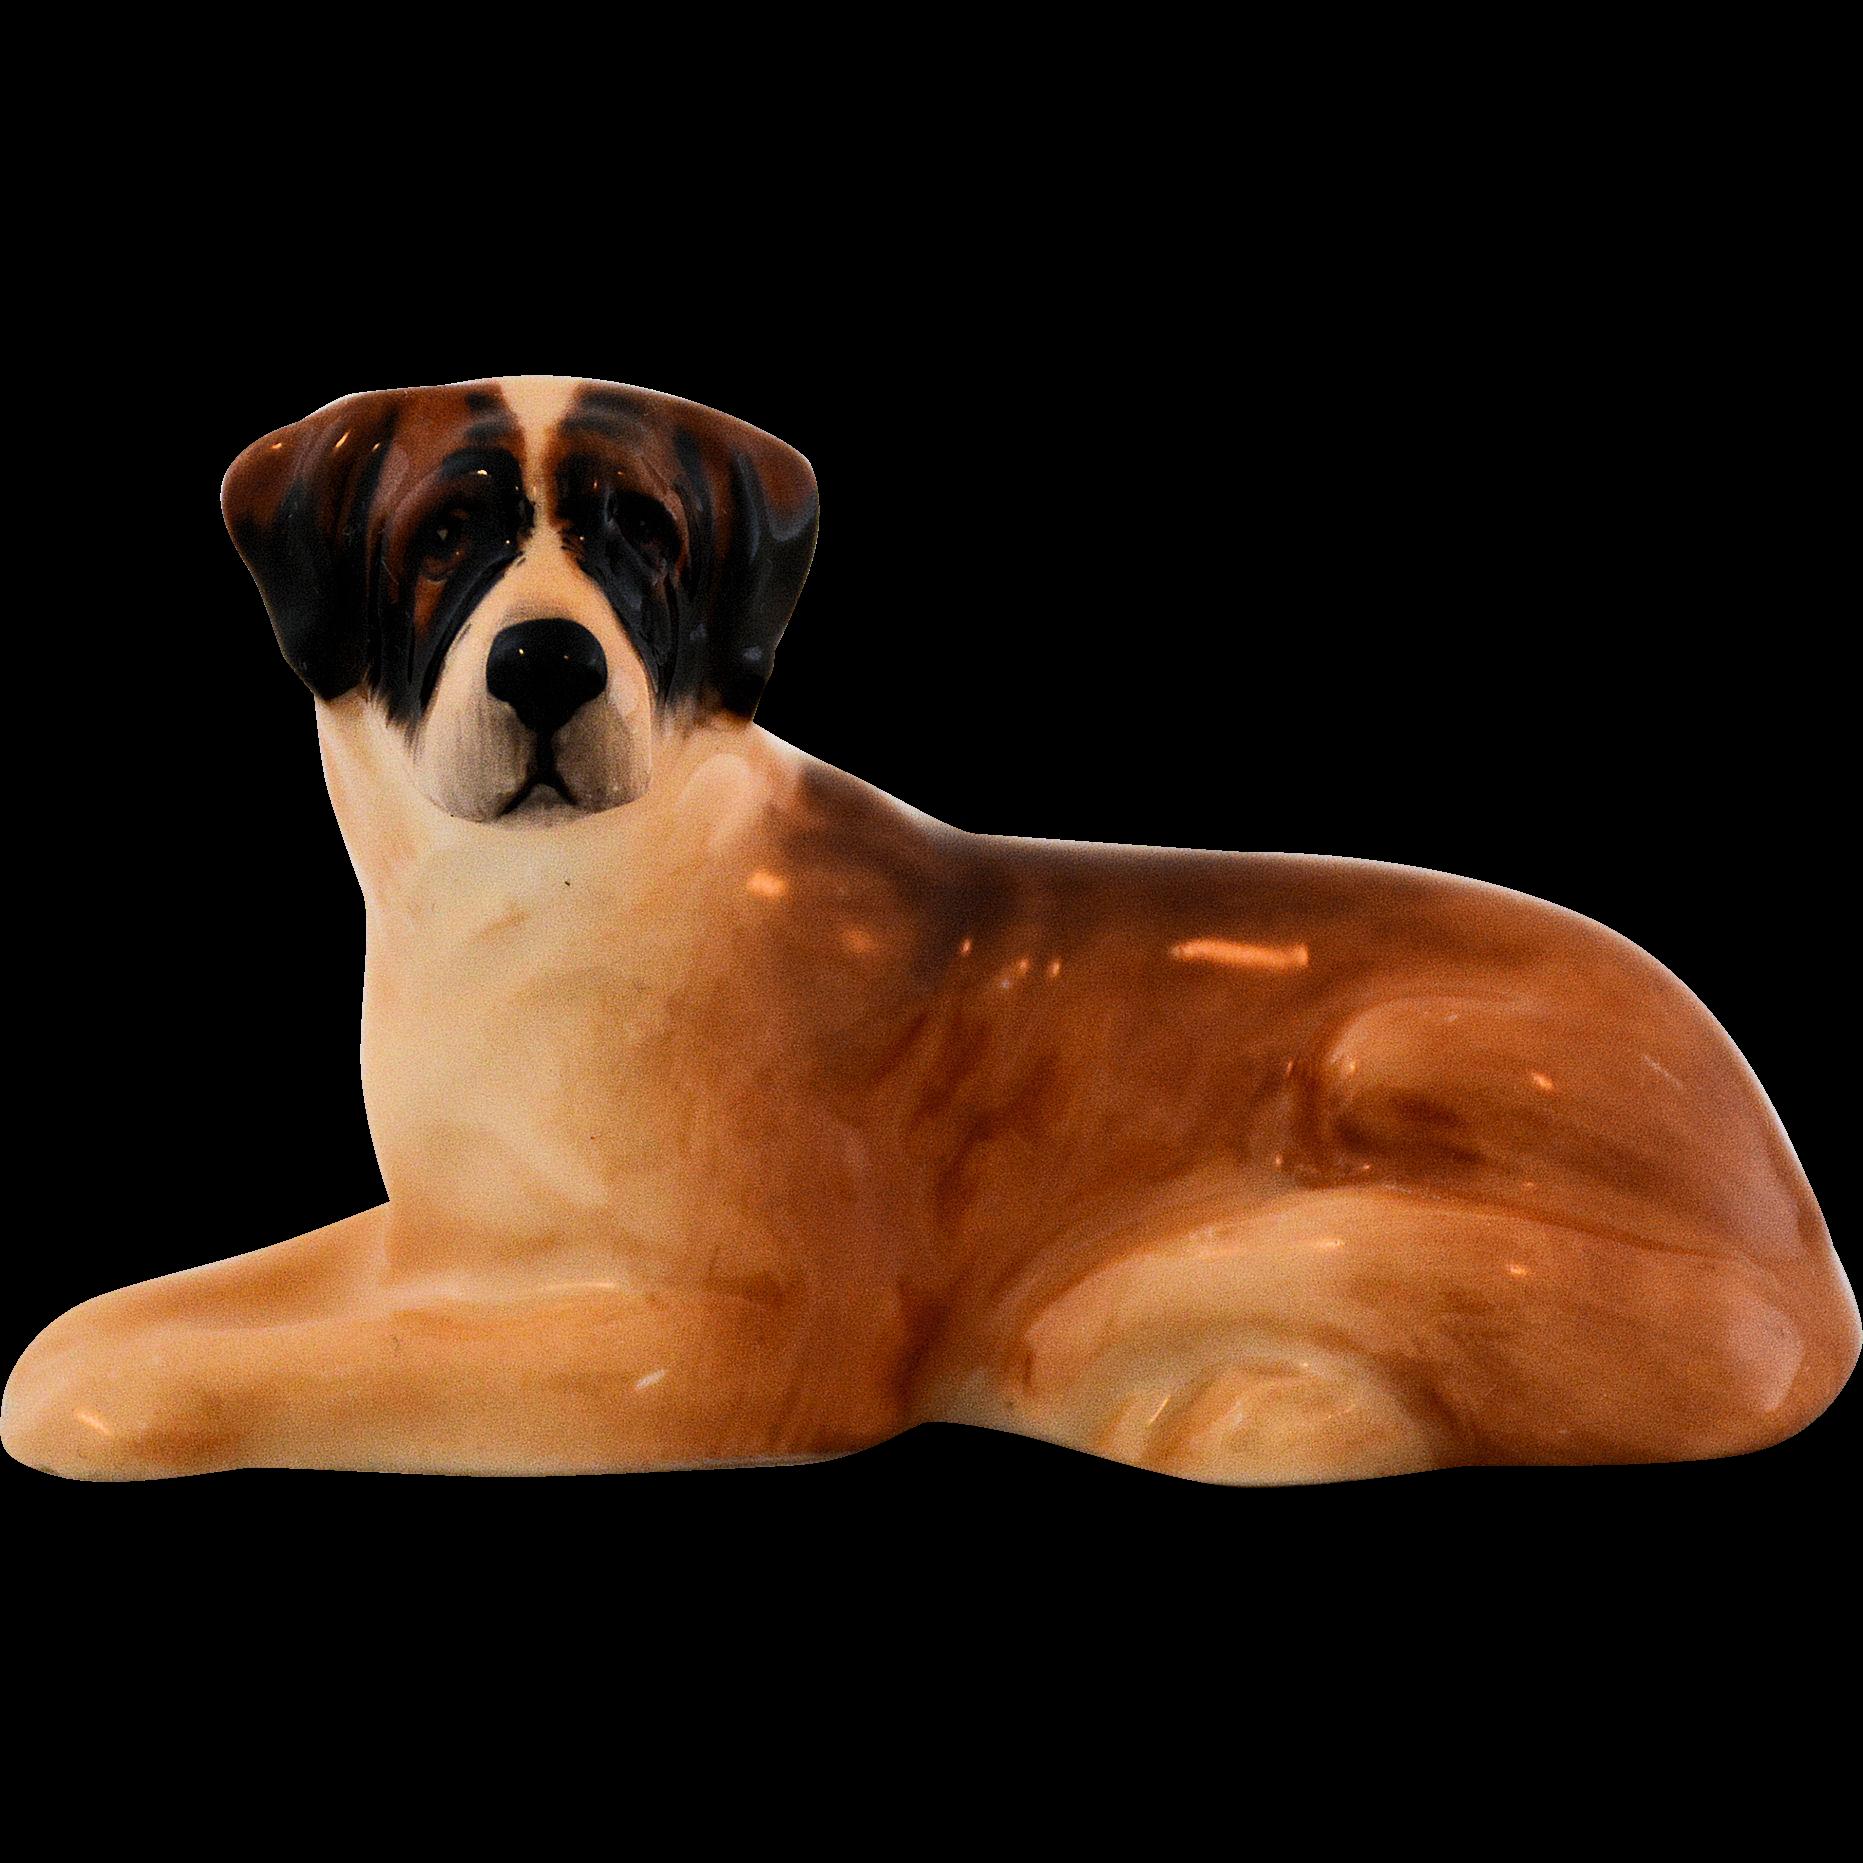 Royal Doulton Dog Figurine Saint Bernard K19 Model Number 1097 St. Bernard